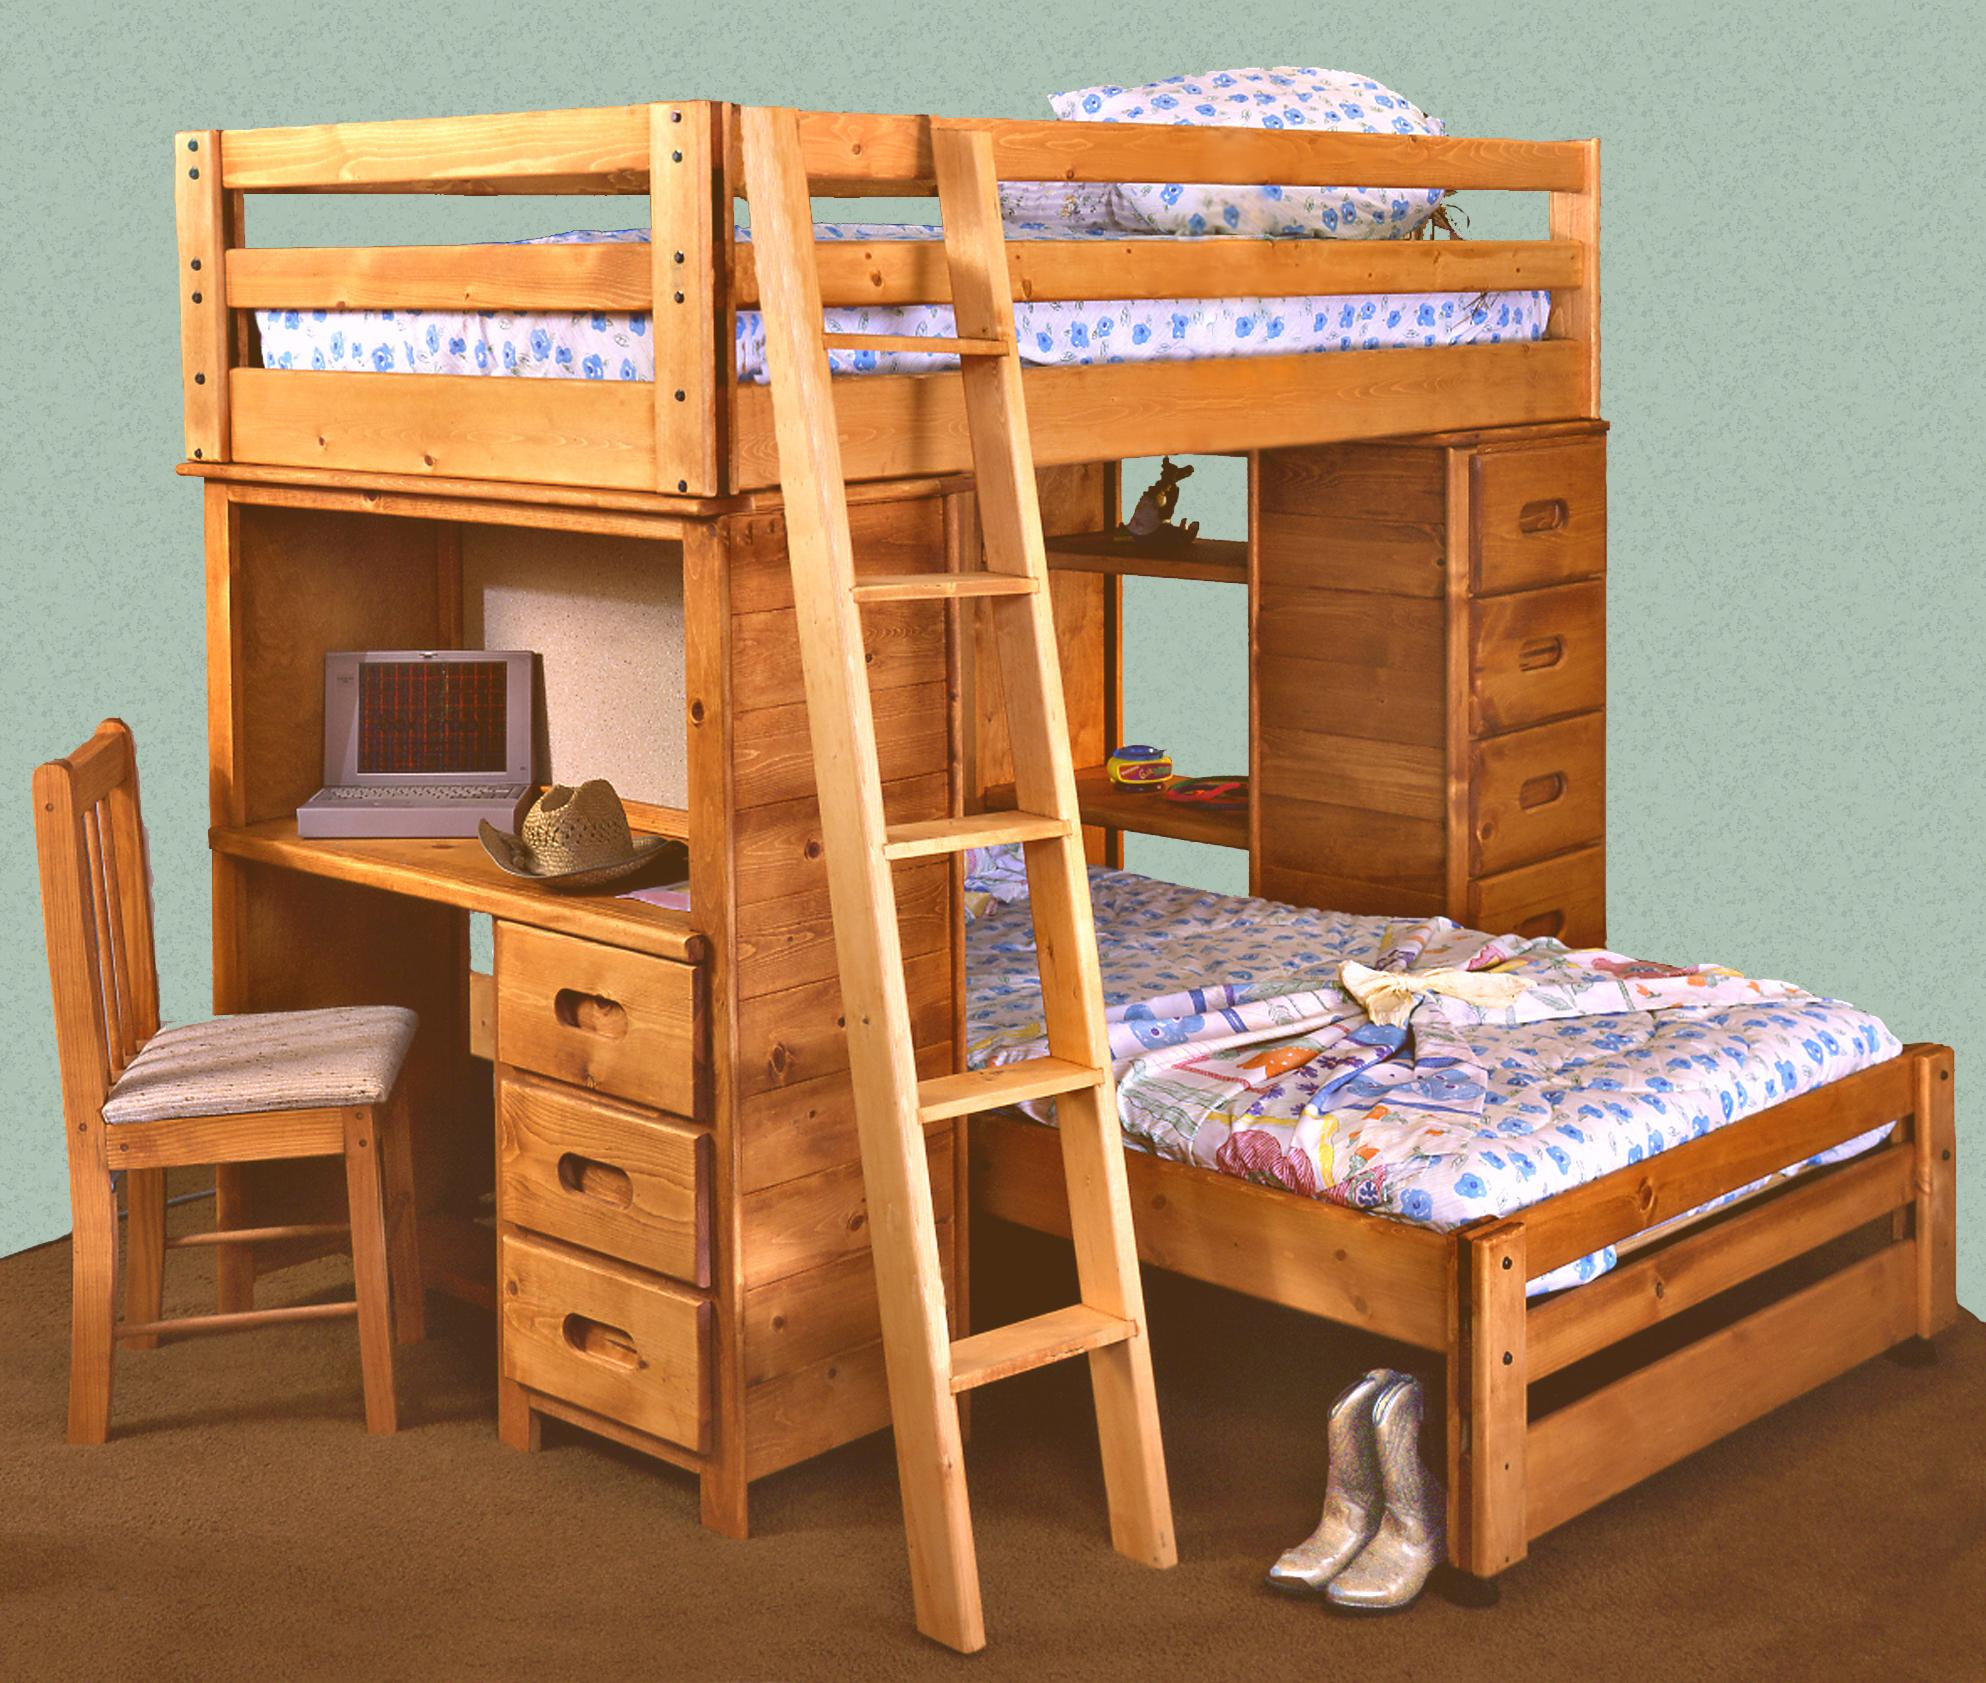 Trendwood Bunkhouse Twin Twin Bronco Loft Bed with Built